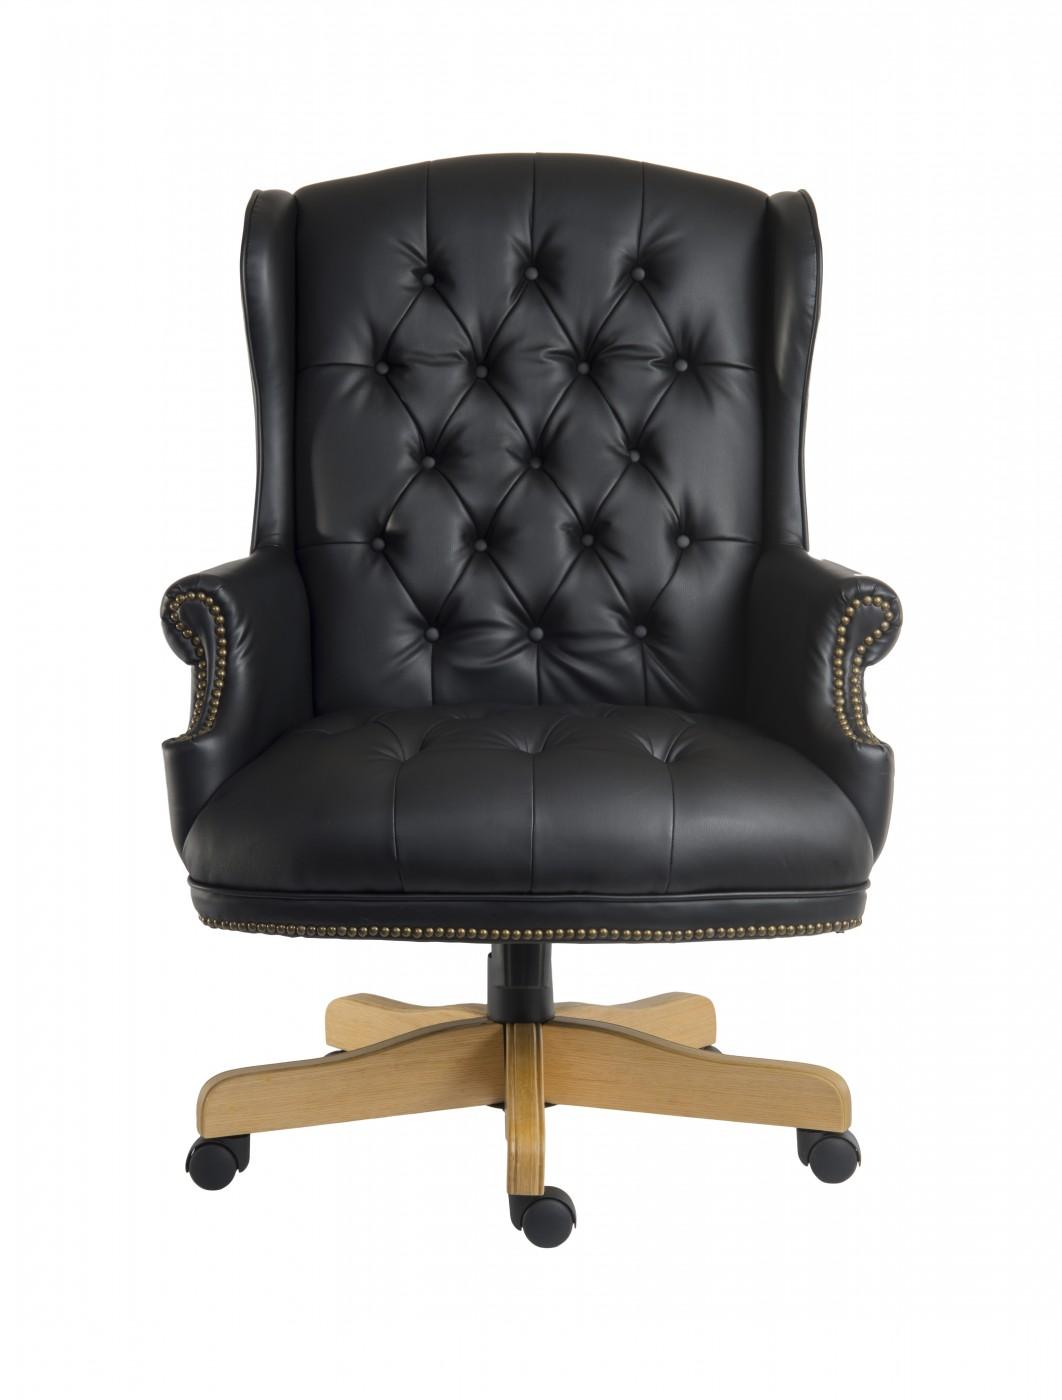 Teknik Chairman Noir Executive Leather Chair B800   Enlarged View